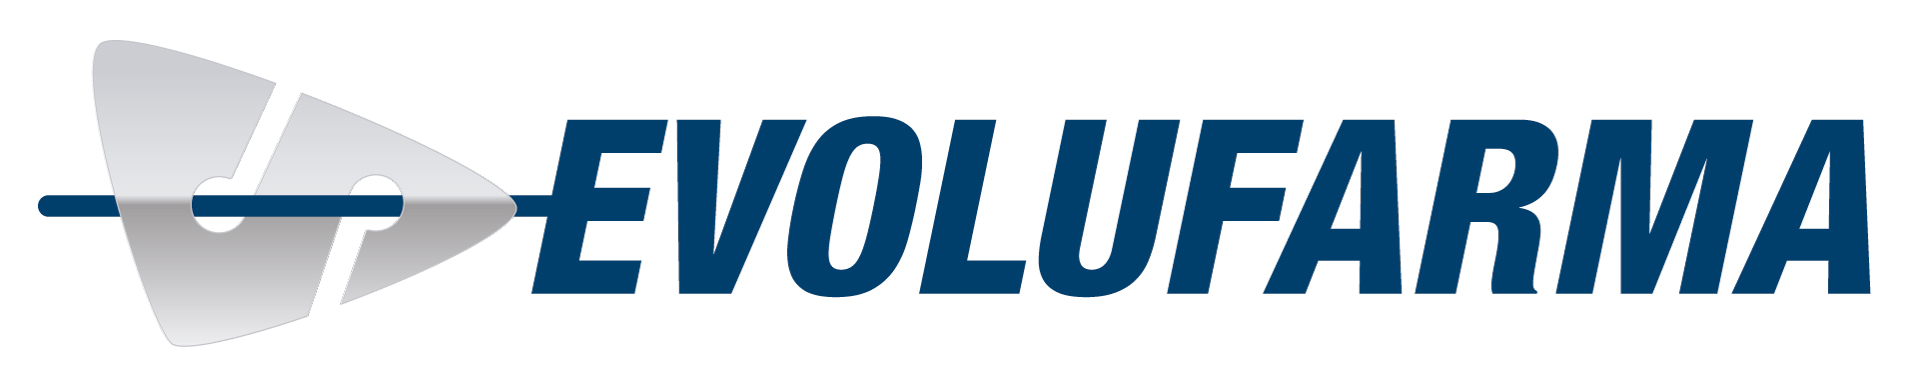 logo_evolufarma_1920x389